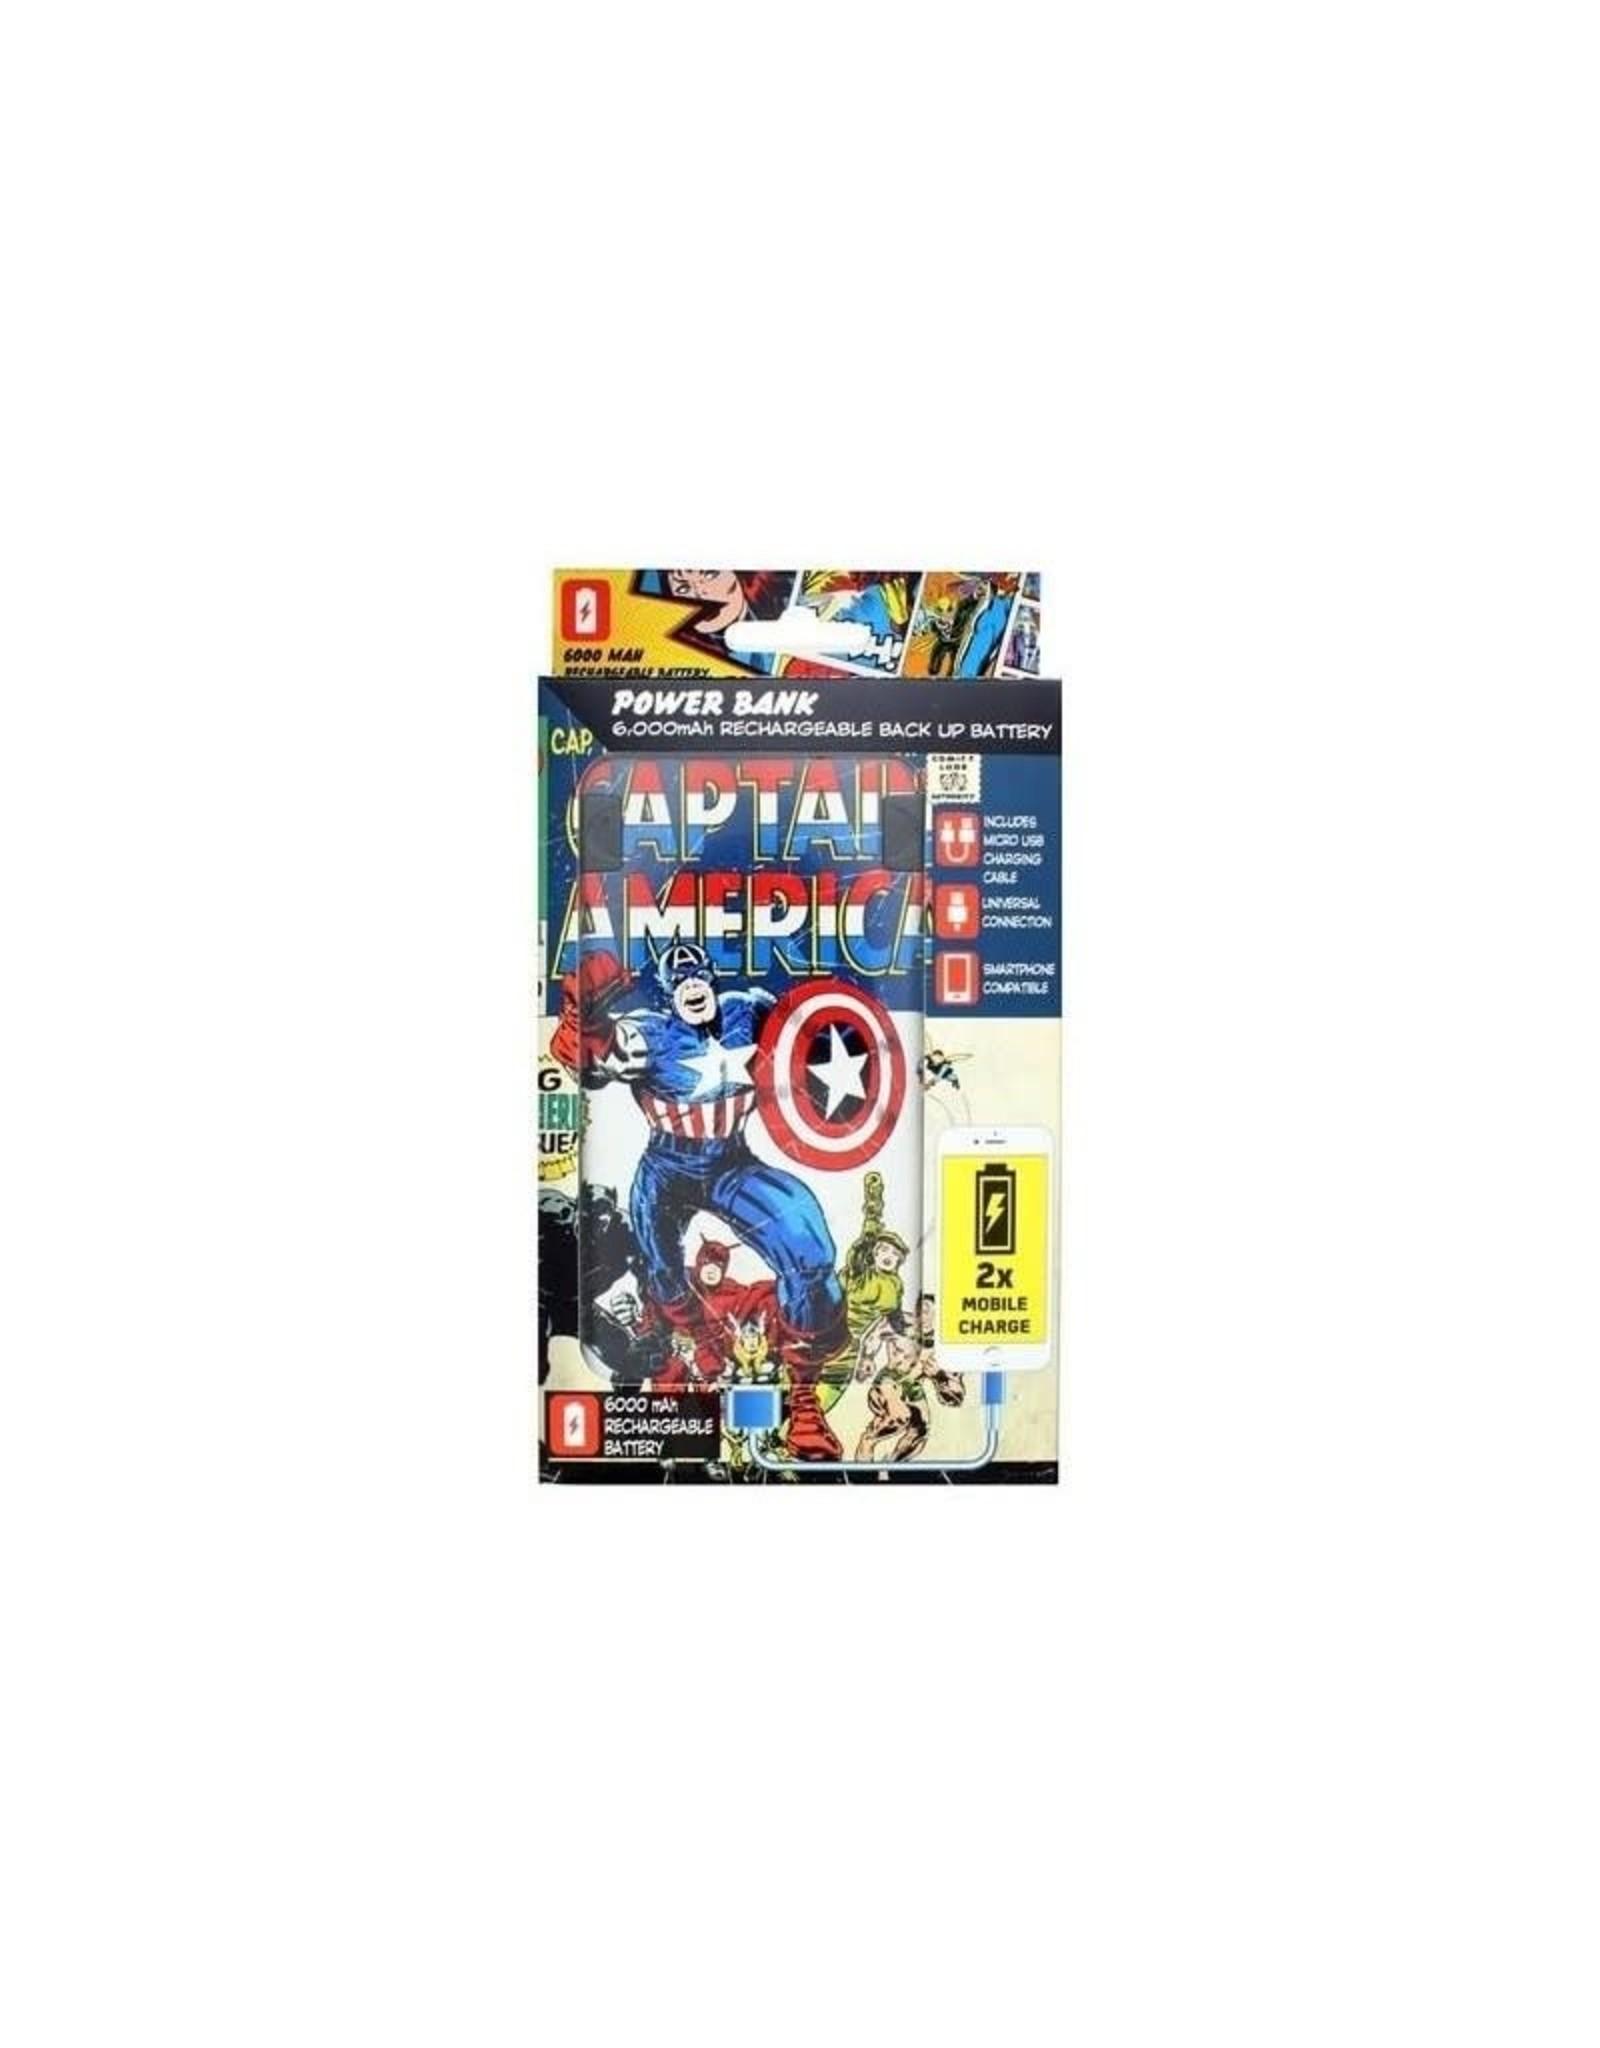 MARVEL - POWER BANK 6000 mAh - Captain America